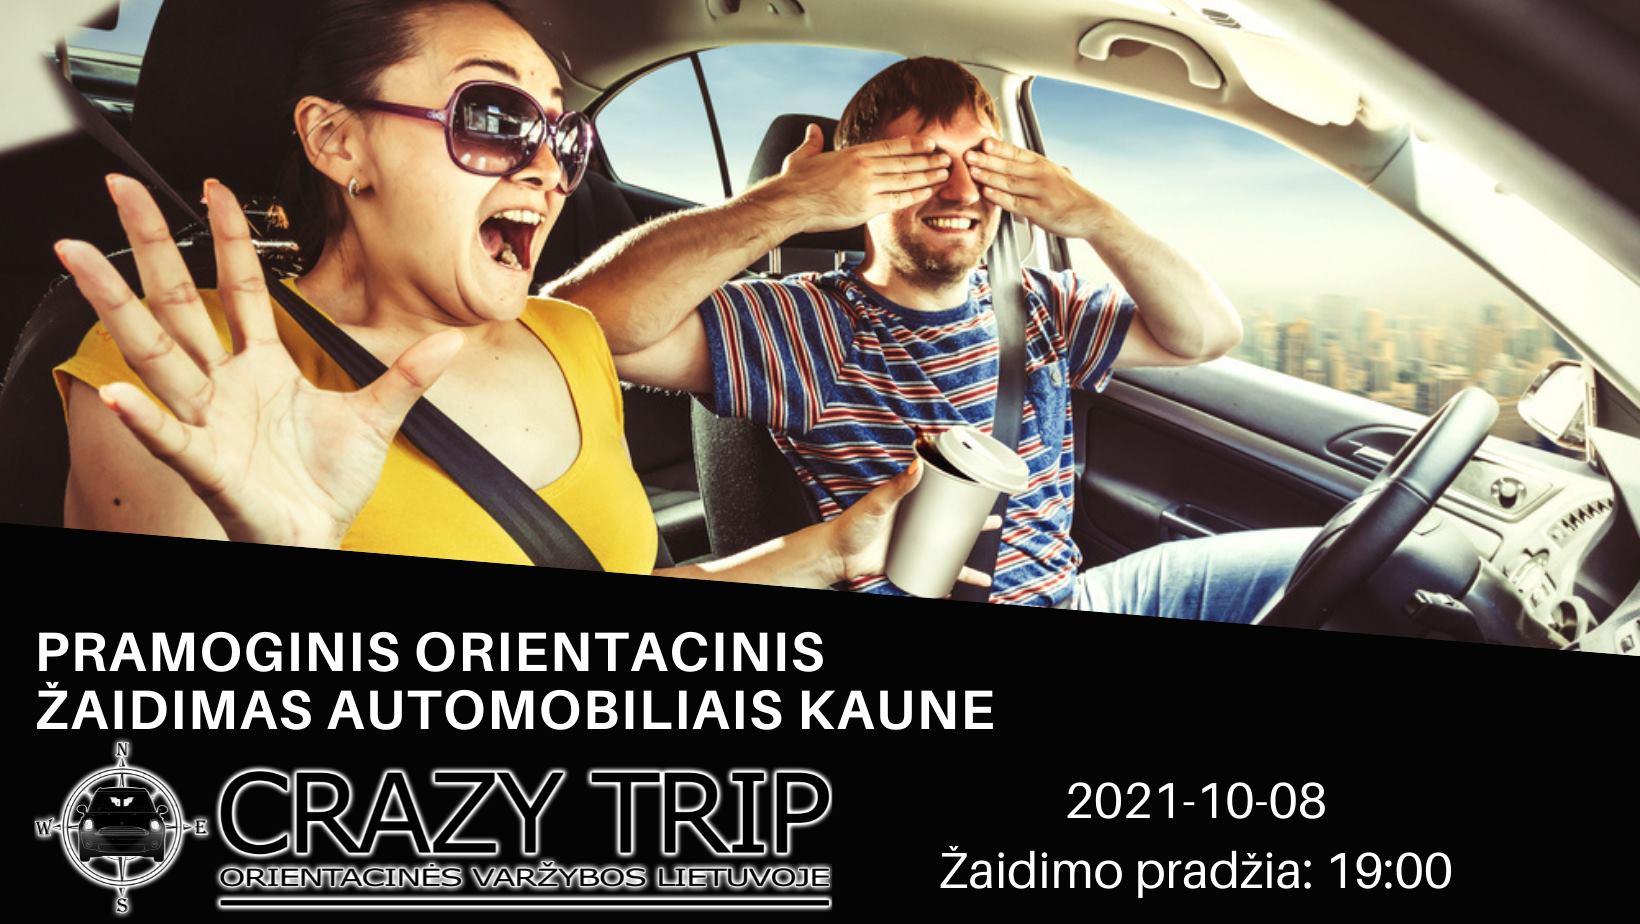 [KAUNAS] Orientacinis žaidimas automobiliais CRAZY TRIP 2021-10-08